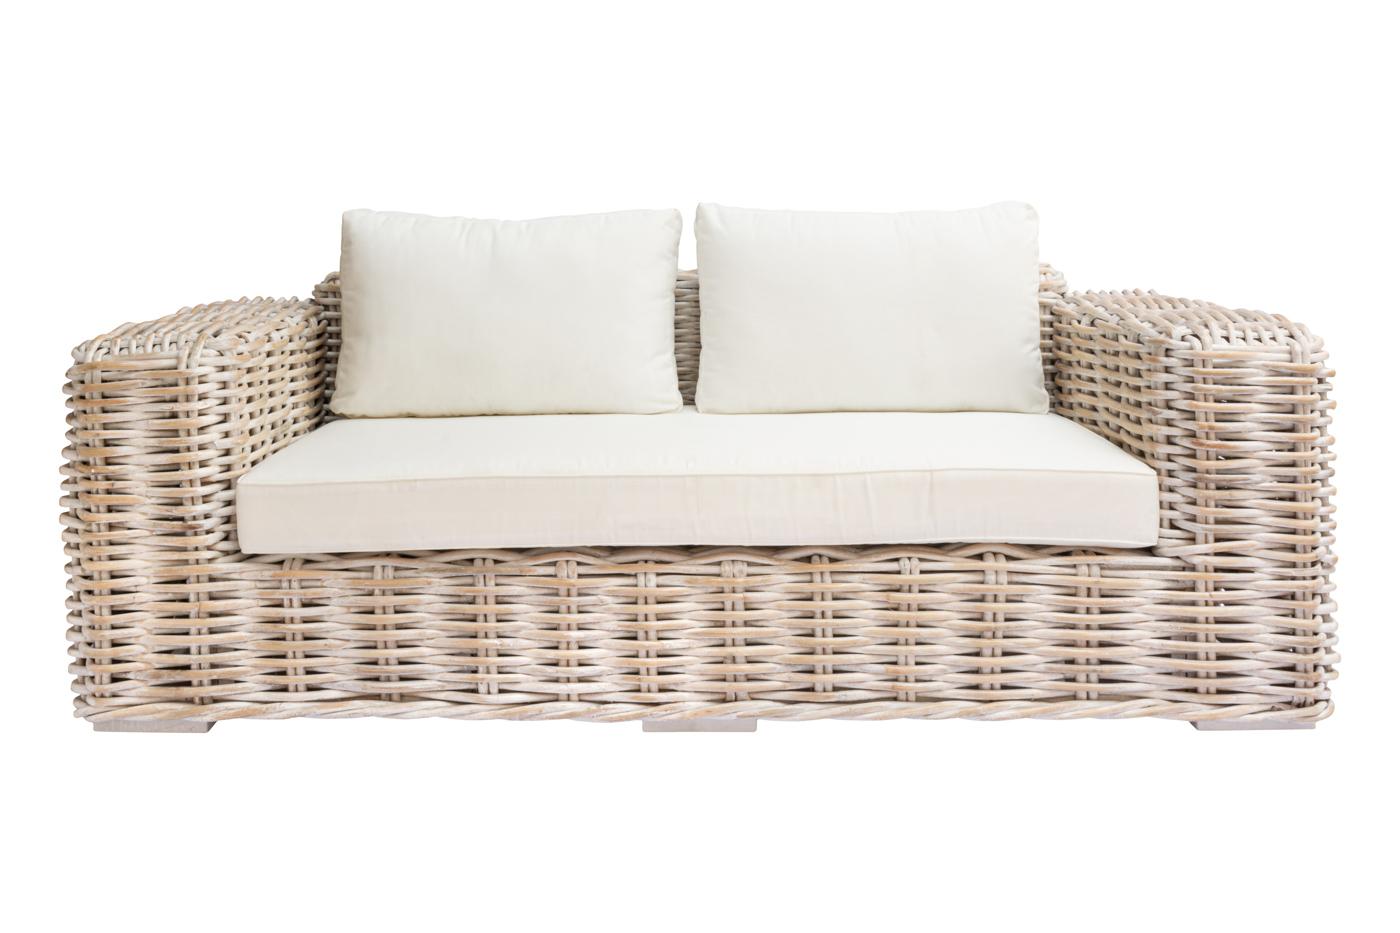 Sofa Cherbon in rattan - 2 Seat